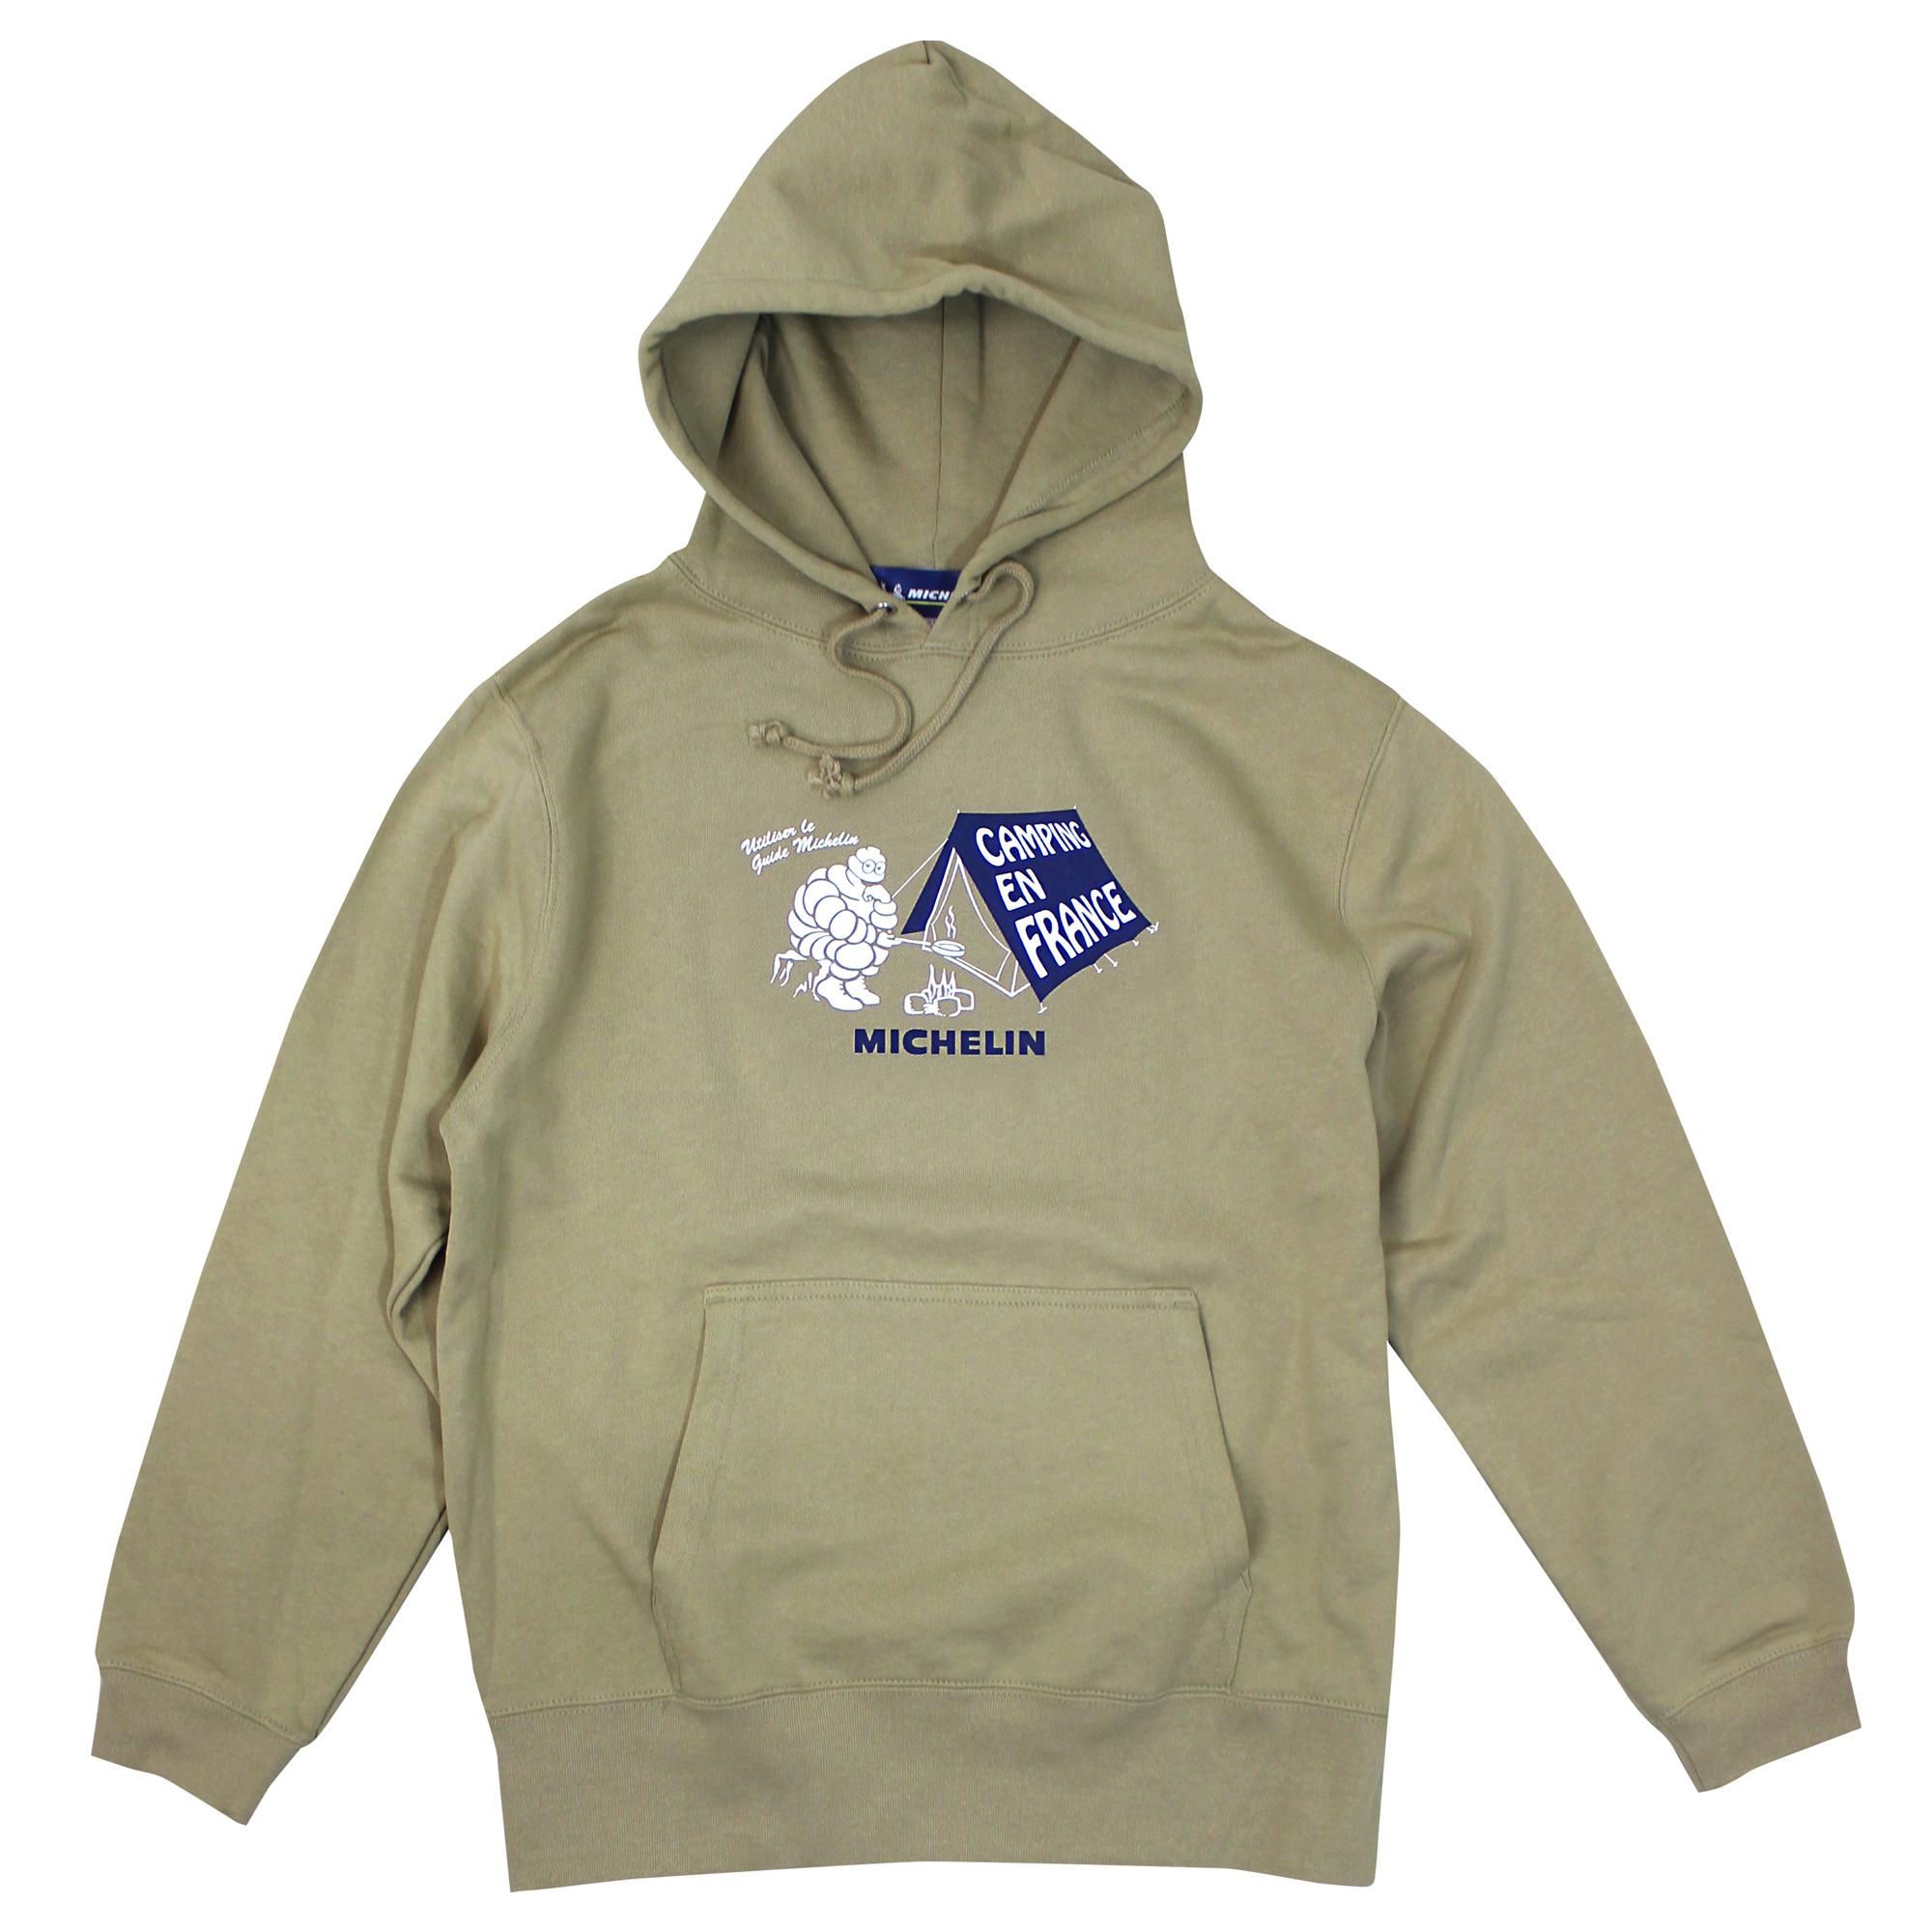 PO Sweat Hoodie/Camp/Michelin/Khaki 【受注生産】